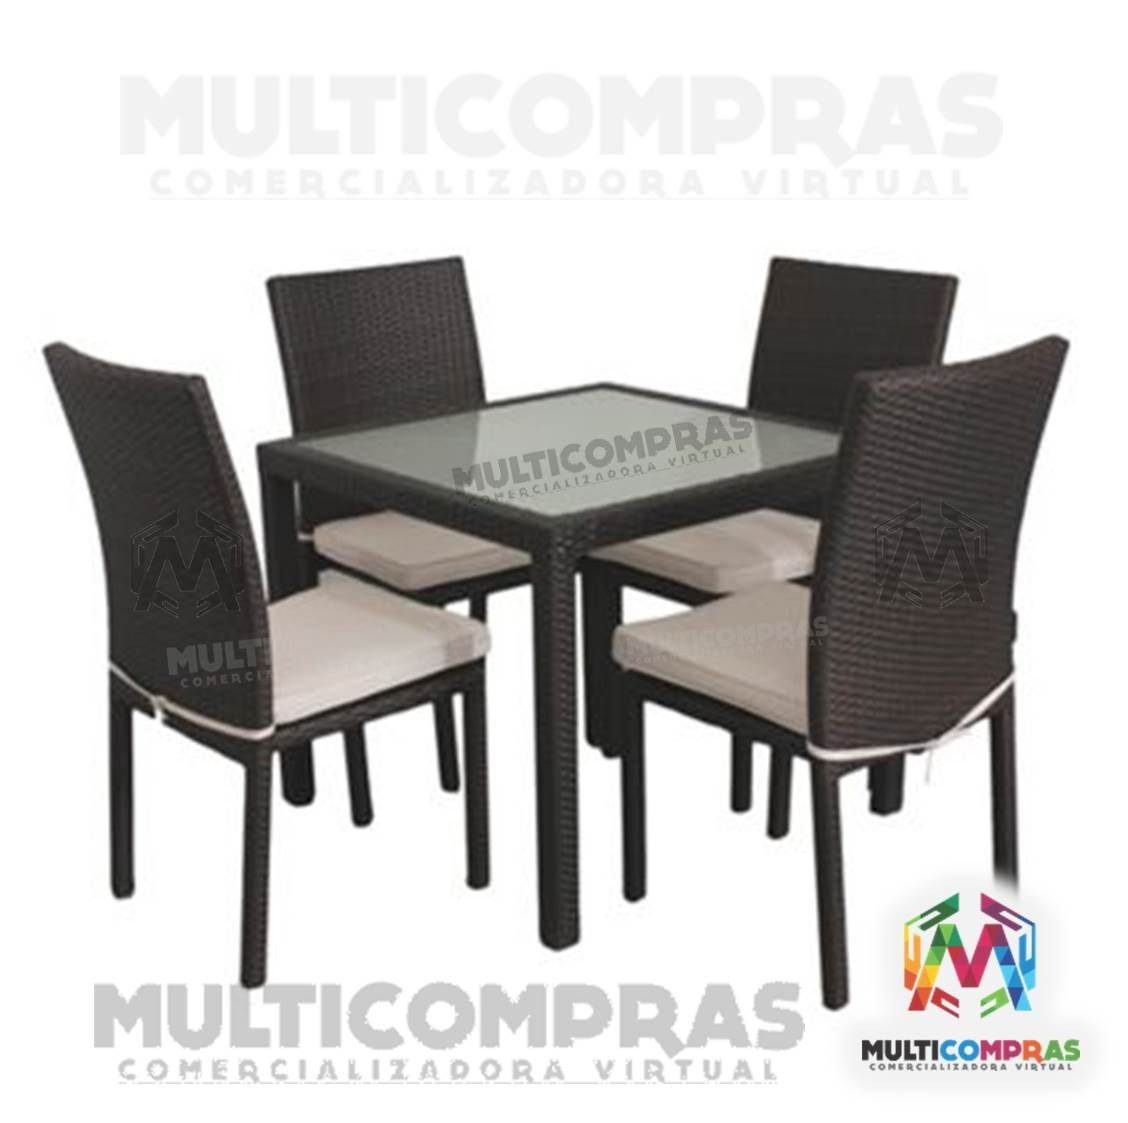 Comedore Comedores Rimax Las Mejores Ideas E Inspiraciones Del  # Muebles Rimax Bucaramanga